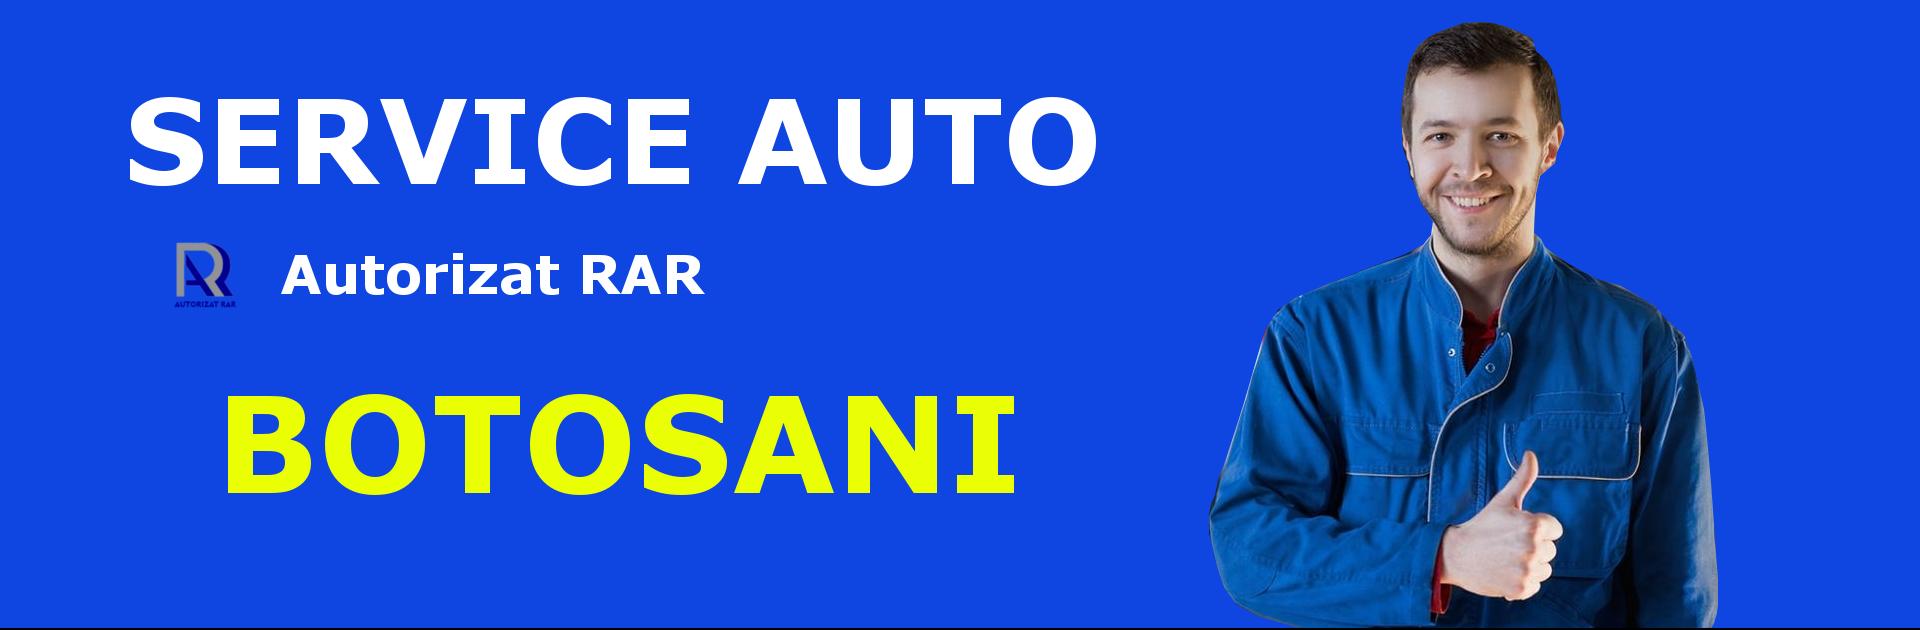 Banner service BOTOSANI